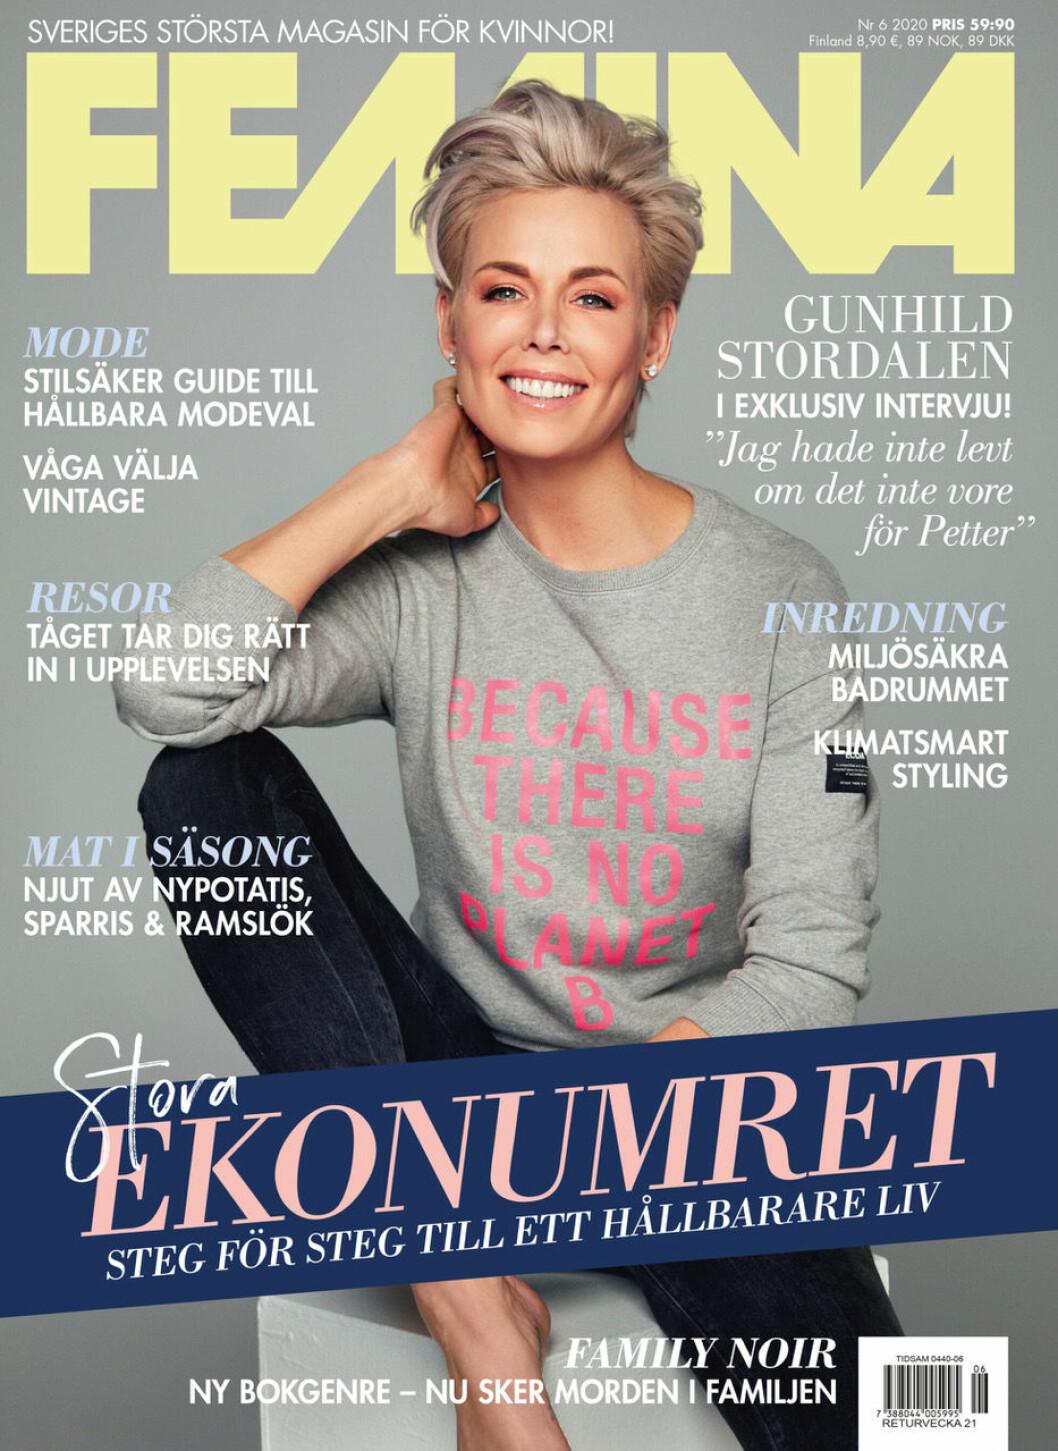 Femina: Gunhild Stordalen